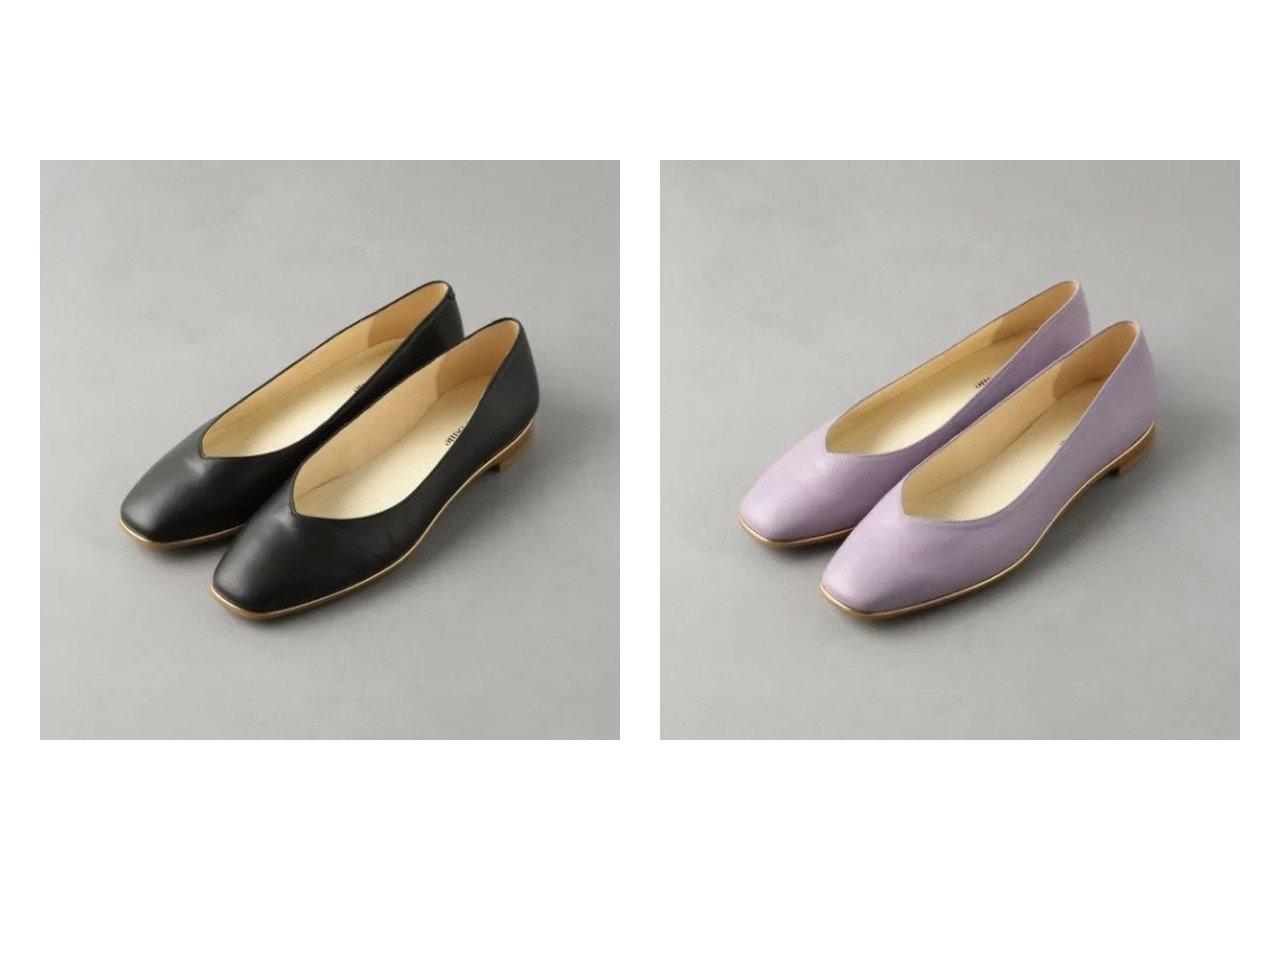 【Odette e Odile/オデット エ オディール】のOFC ソフトVカット FLT15↓↑ シューズ・靴のおすすめ!人気、トレンド・レディースファッションの通販 おすすめで人気の流行・トレンド、ファッションの通販商品 メンズファッション・キッズファッション・インテリア・家具・レディースファッション・服の通販 founy(ファニー) https://founy.com/ ファッション Fashion レディースファッション WOMEN シューズ フォルム フラット ベーシック 人気 |ID:crp329100000012960